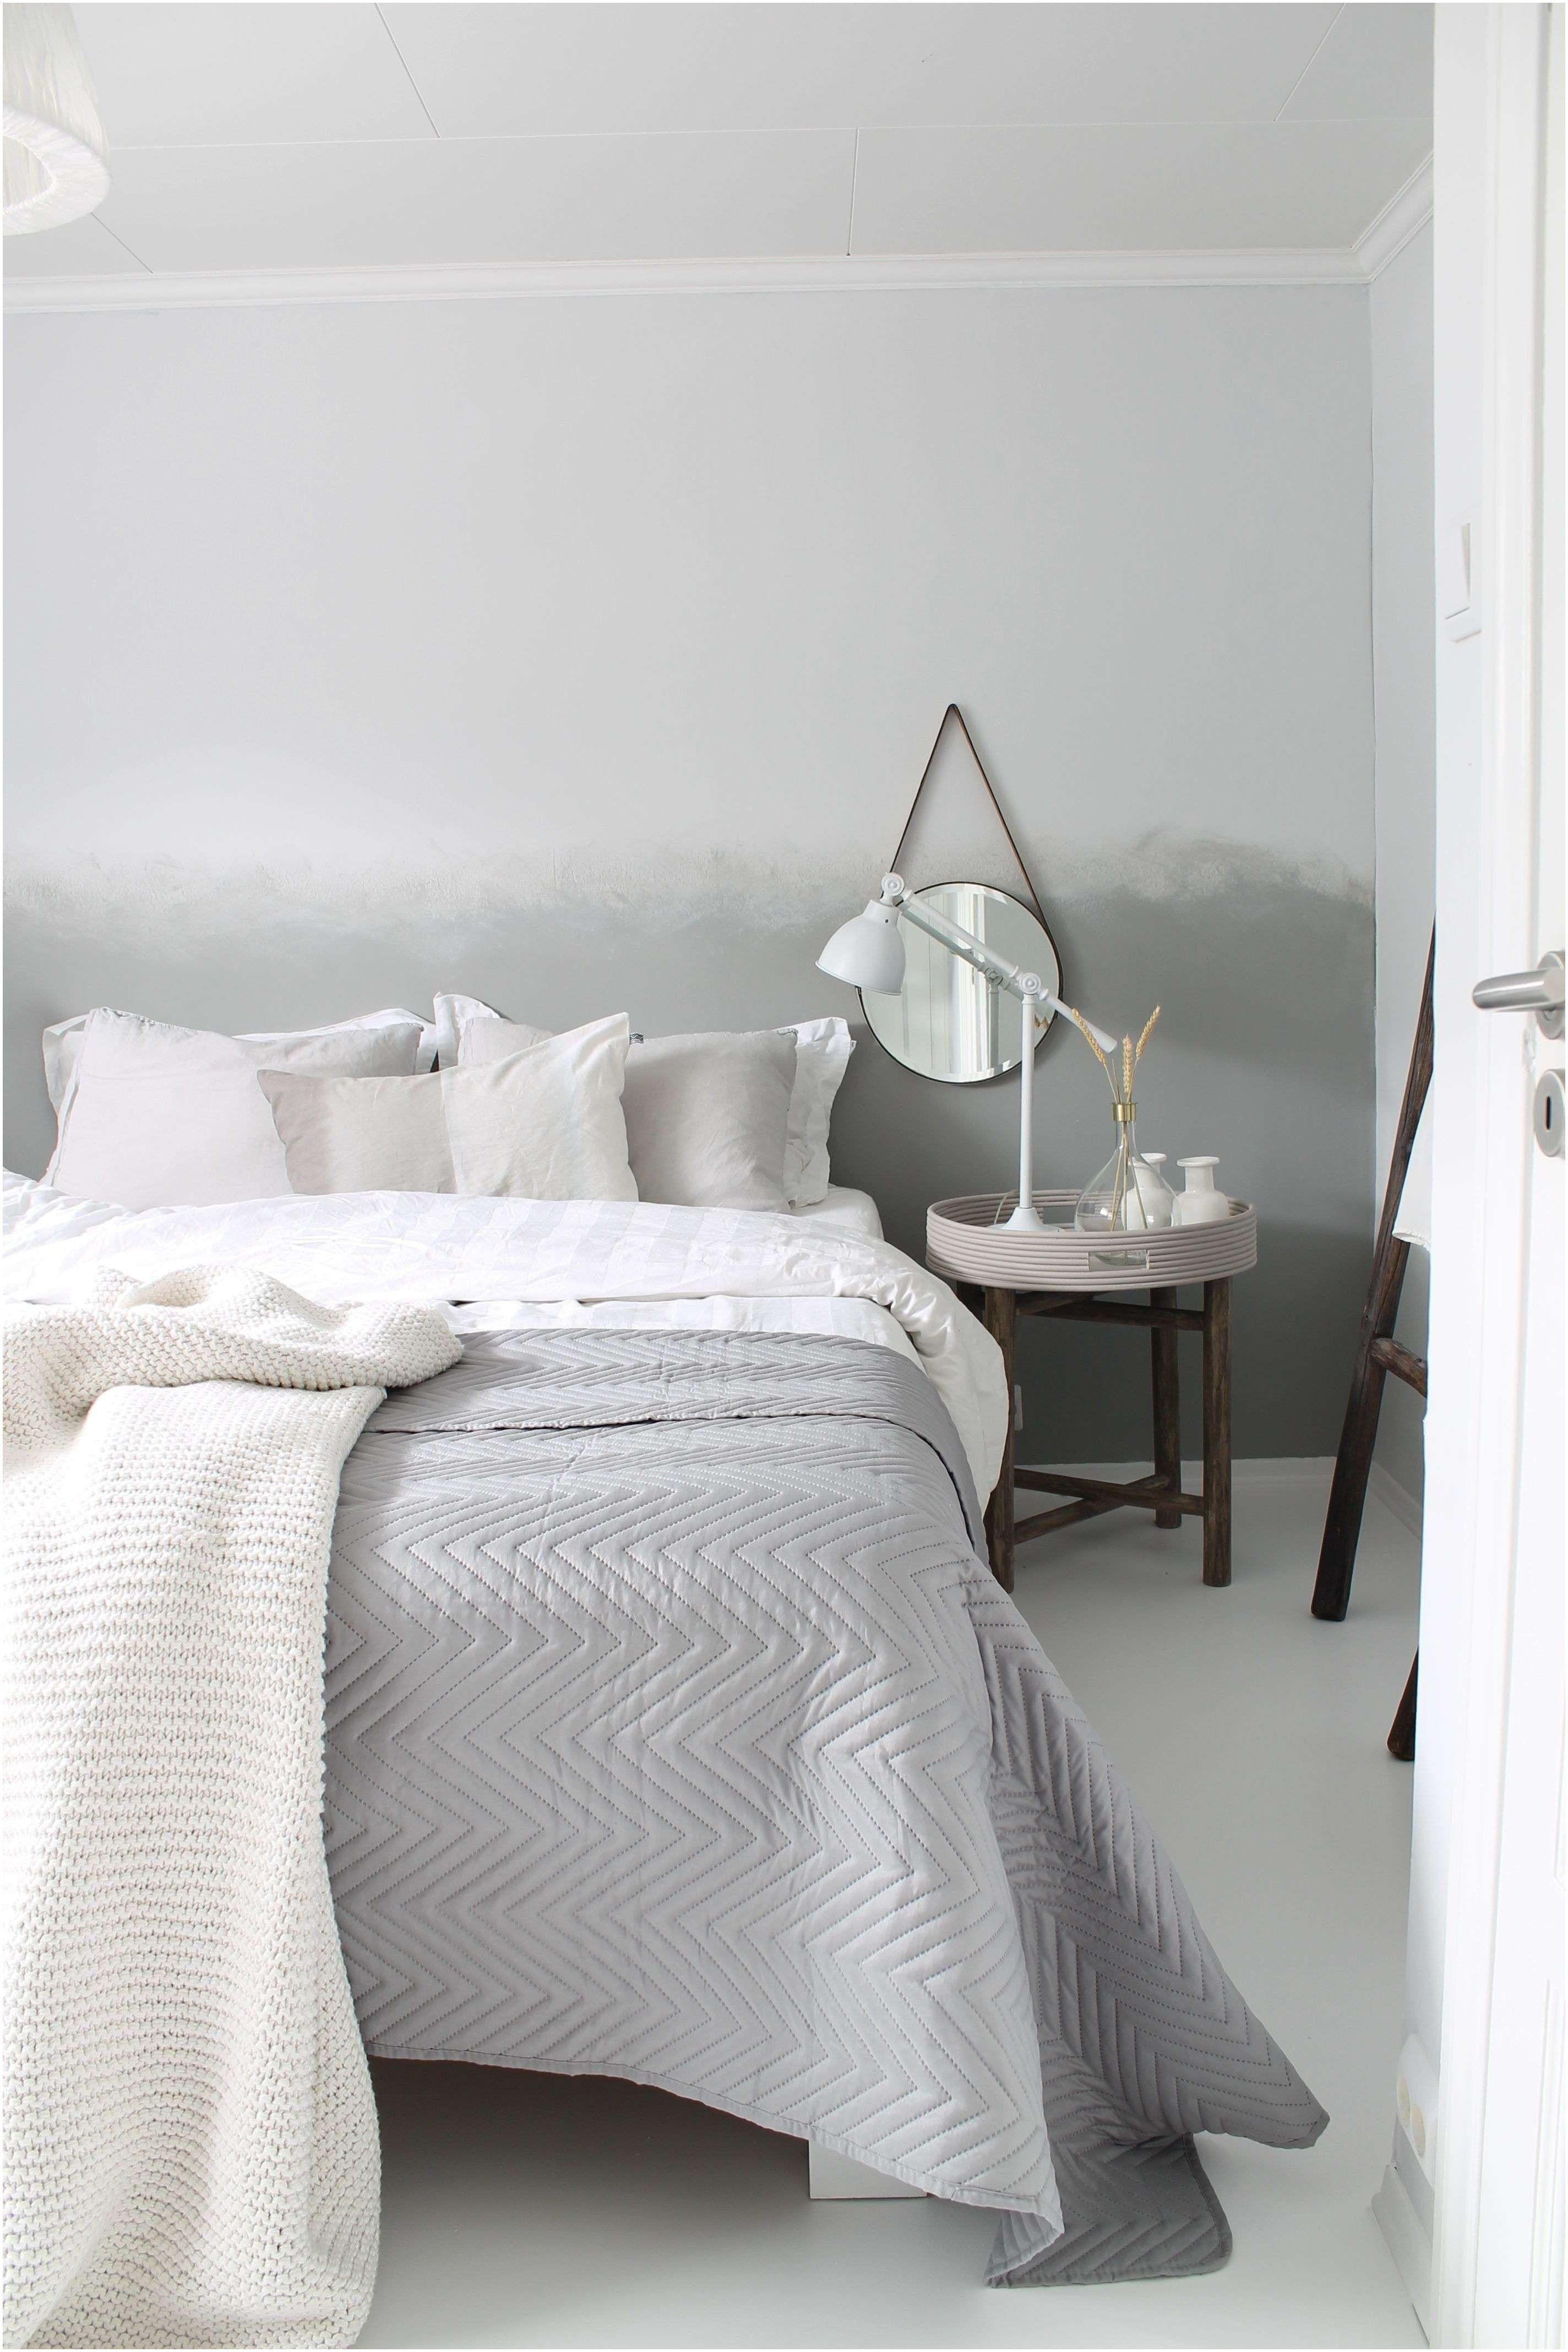 Black And White Bedroom Decor Elegant 39 Luxury Gray And White Bedroom Ideas White Bedroom Decor Traditional Bedroom Sets White Wood Bedroom Furniture